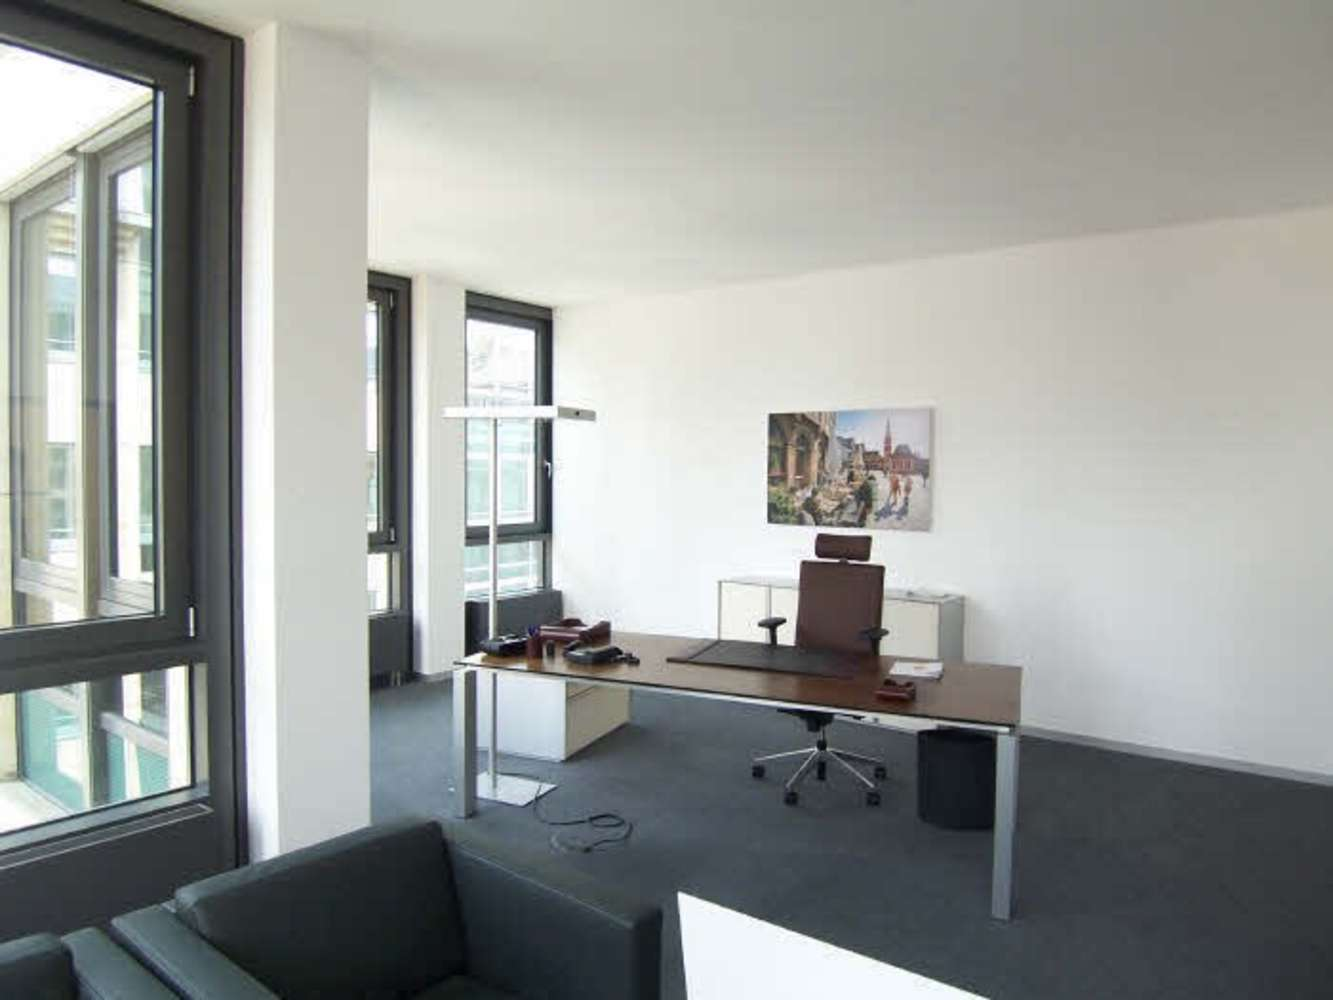 Büros Frankfurt am main, 60329 - Büro - Frankfurt am Main - F2640 - 10339008